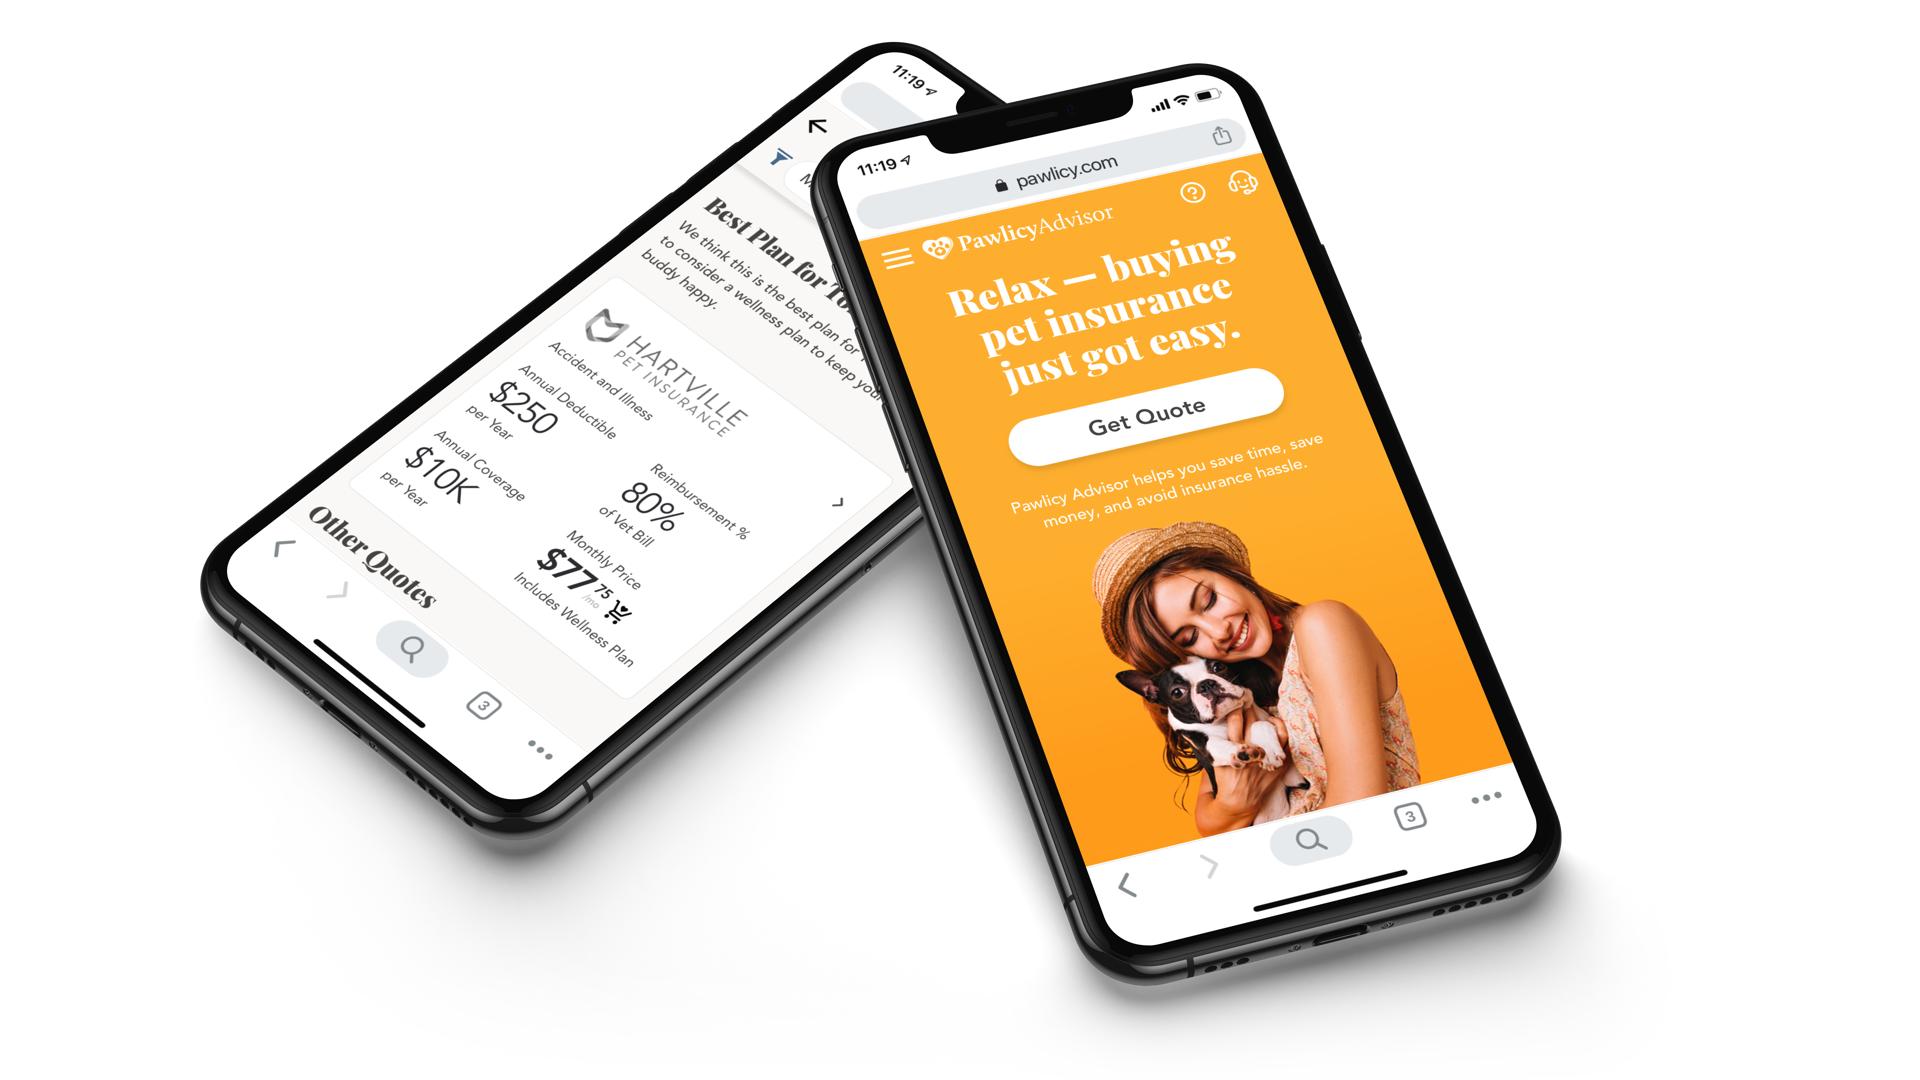 pawlicy-advisor-on-iphone